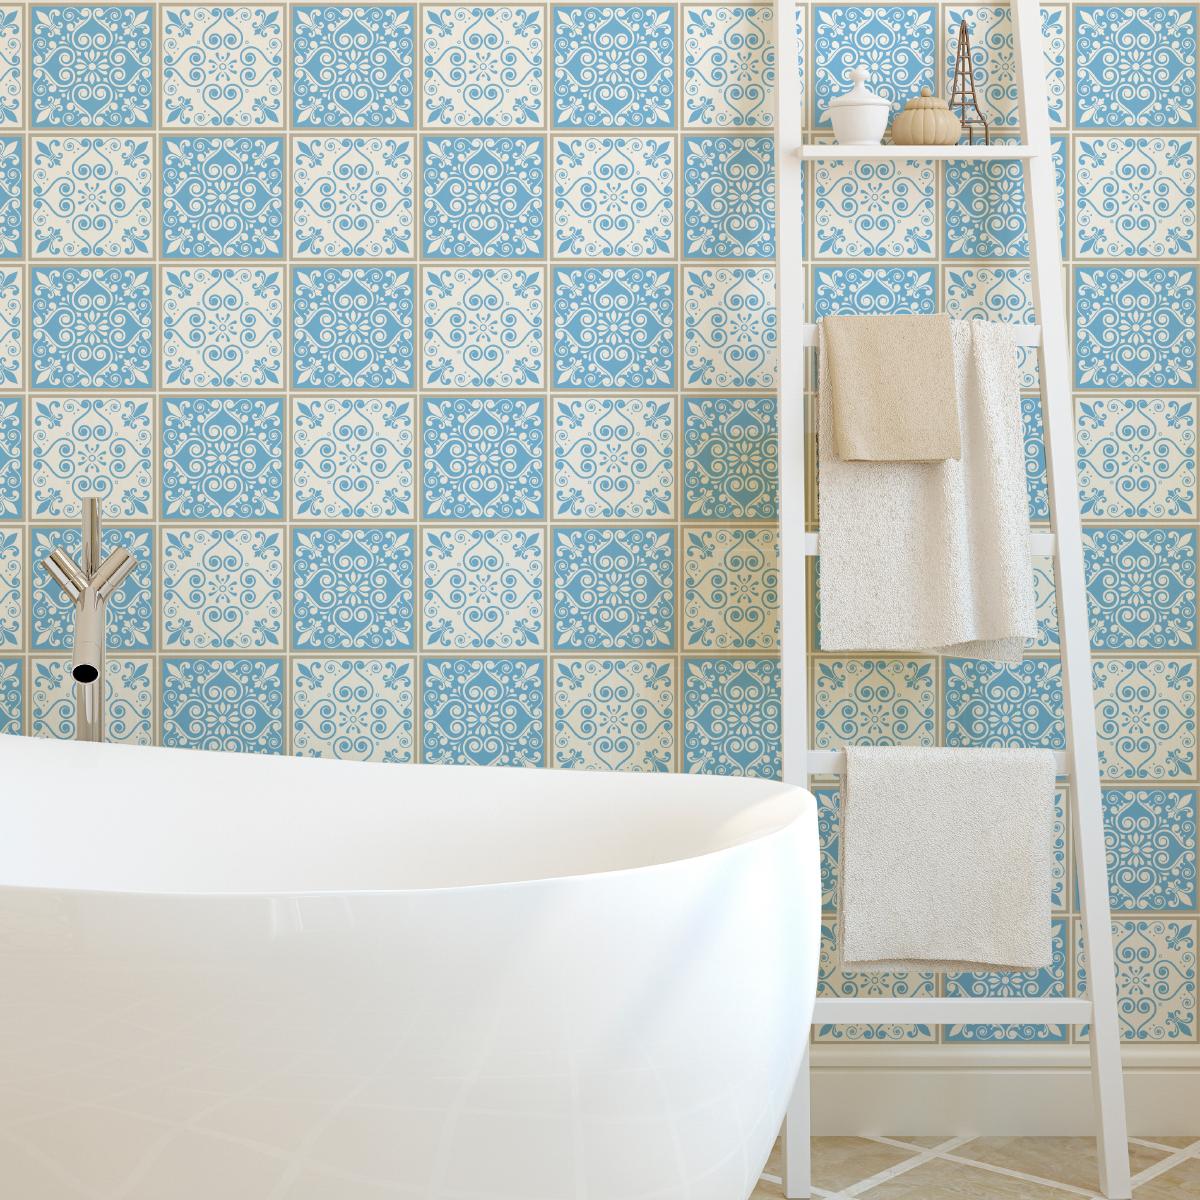 60 stickers carrelages azulejos gloria salle de bain et wc salle de bain ambiance sticker. Black Bedroom Furniture Sets. Home Design Ideas